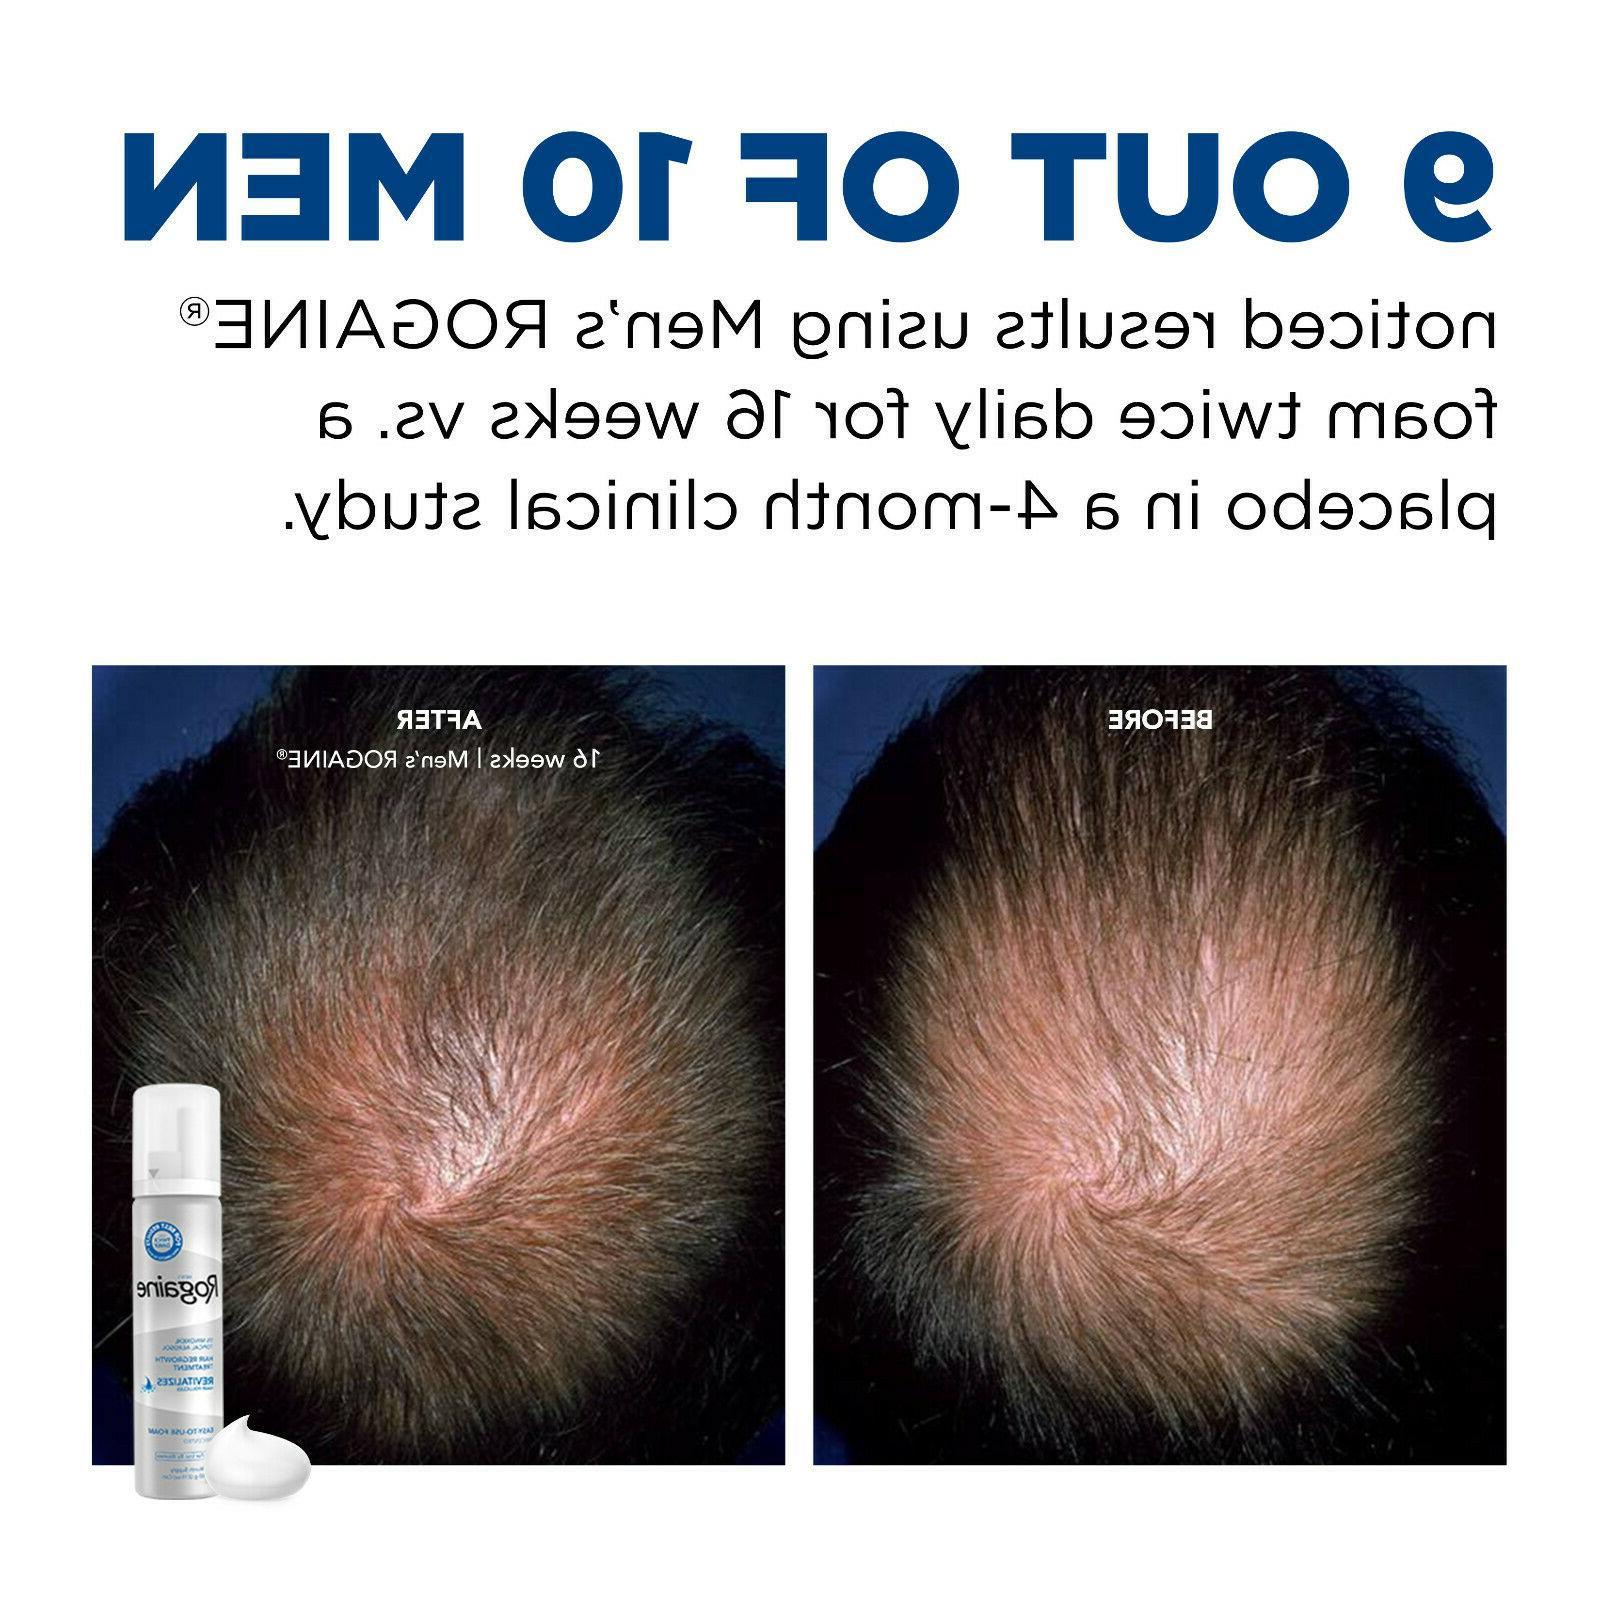 Rogaine Foam Hair & Treatment 5% Minoxidil - Supply